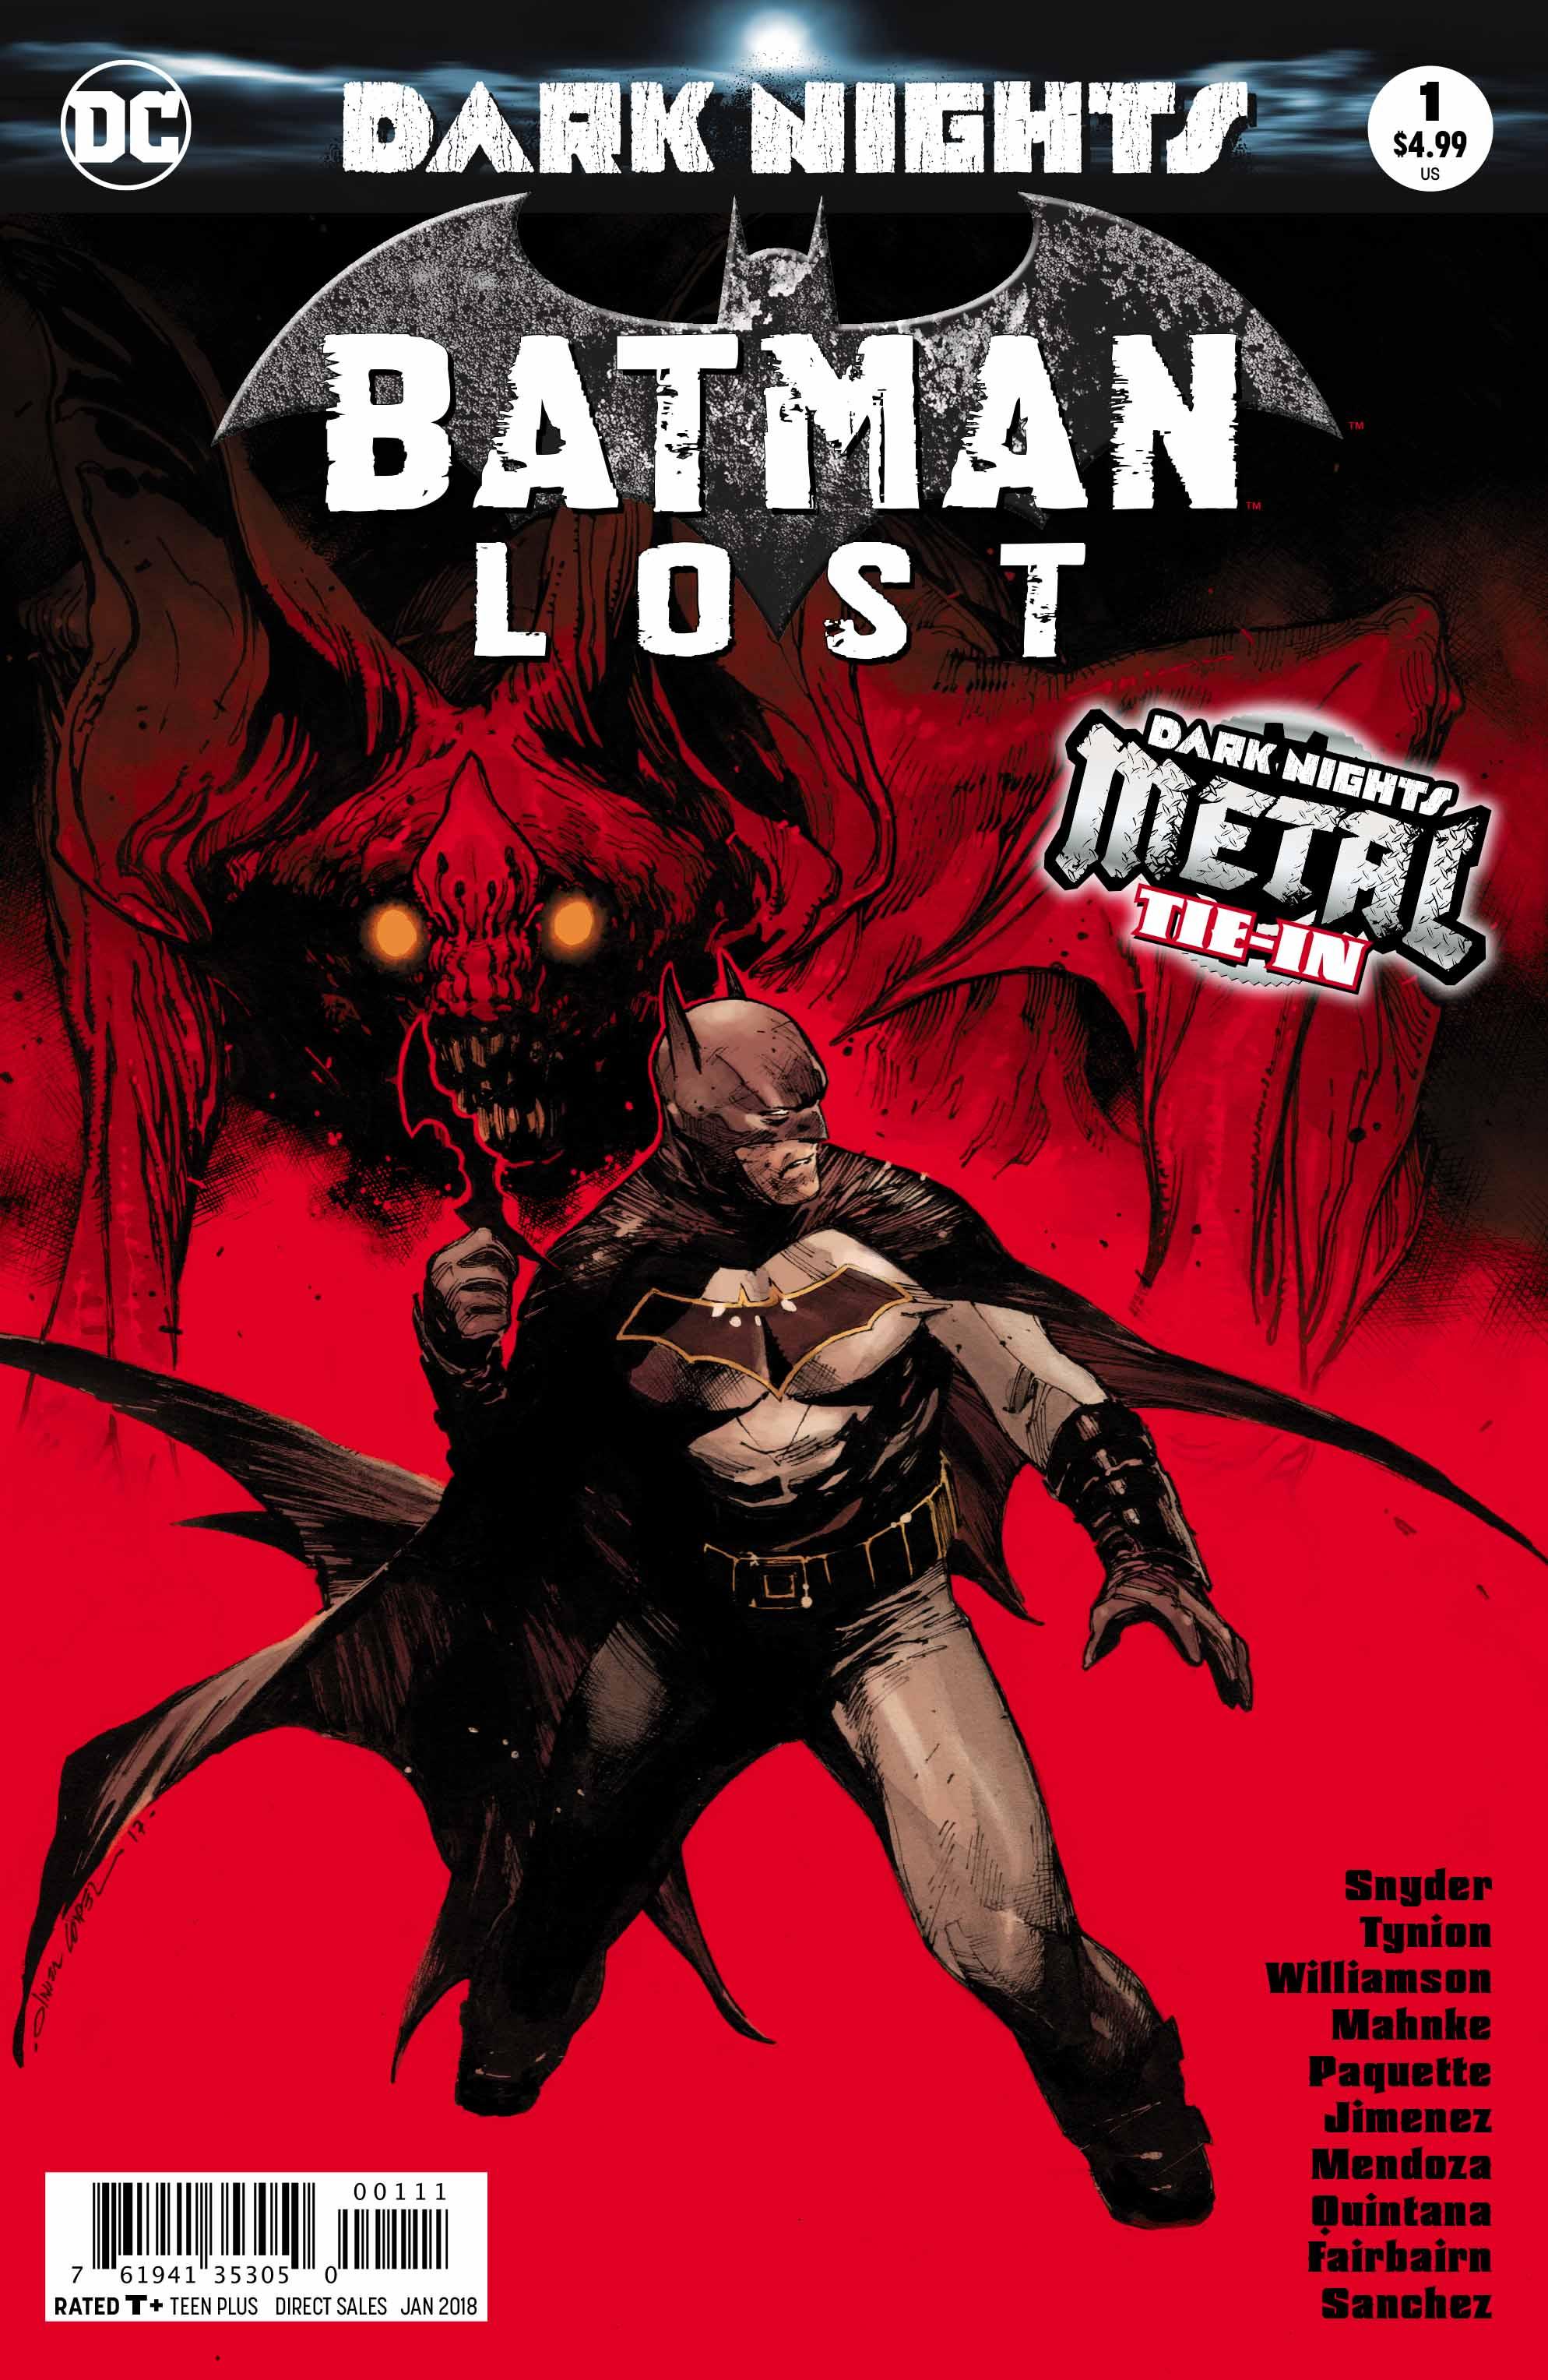 Batman Lost #1 (METAL Tie-In)